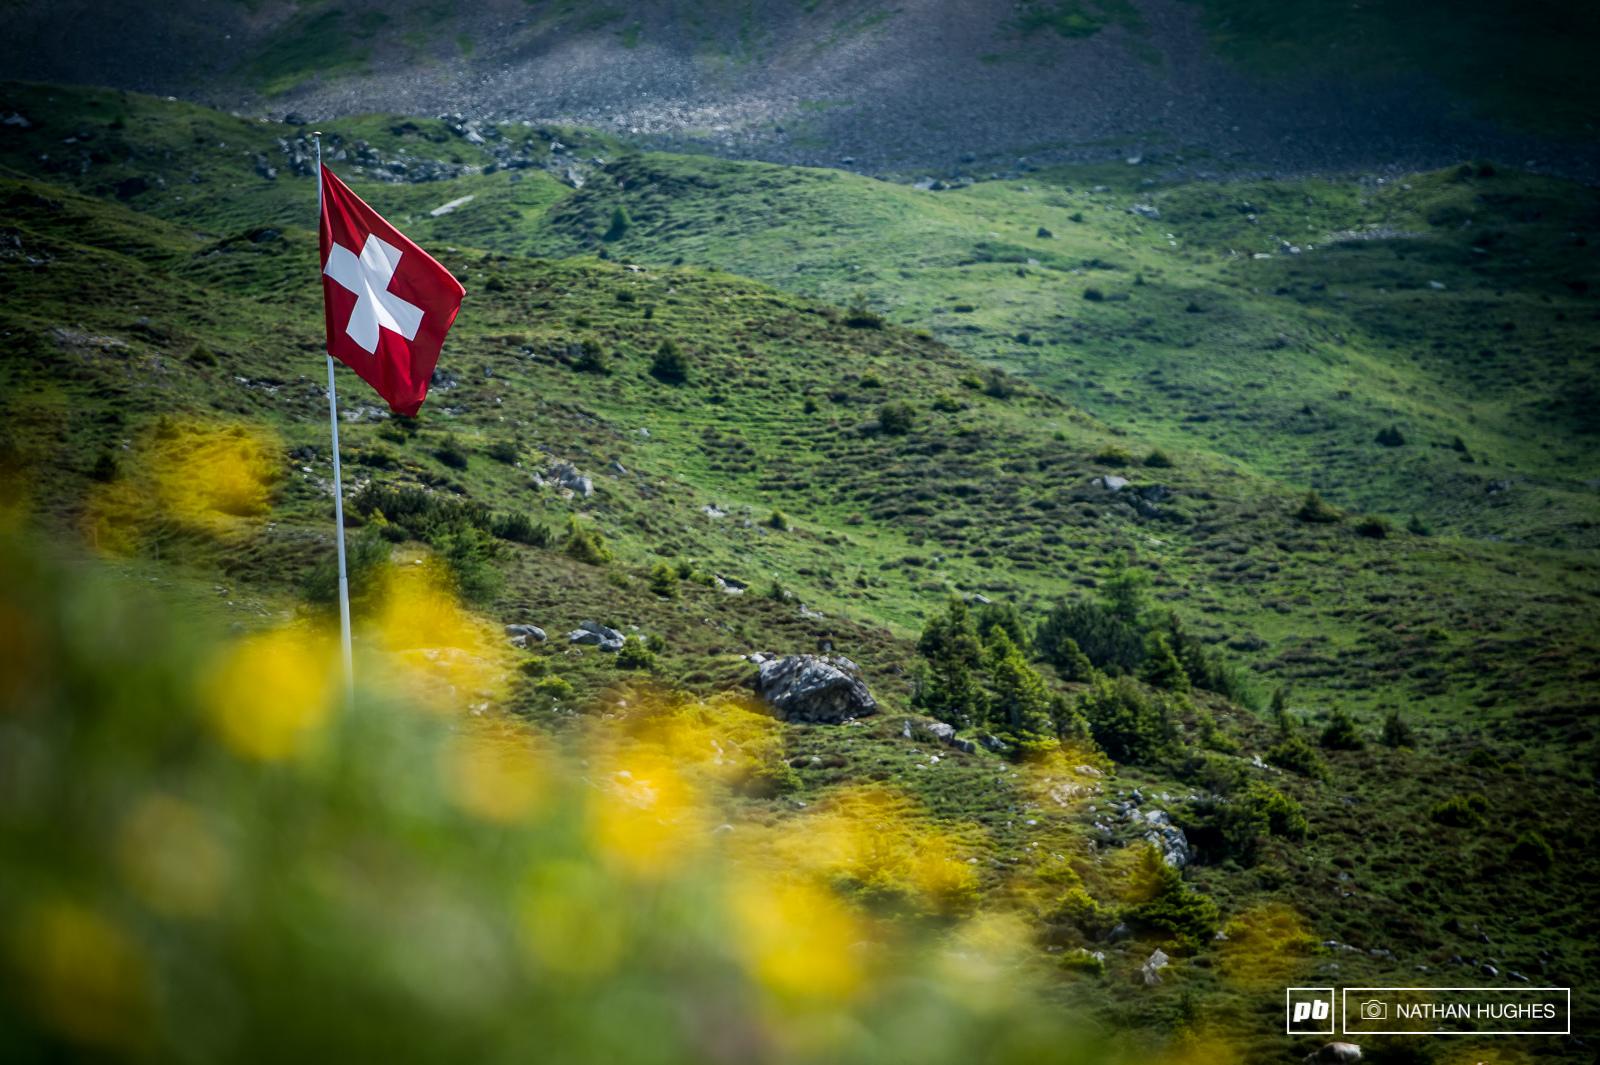 All hail the beautiful mountain scenery of Switzerland.